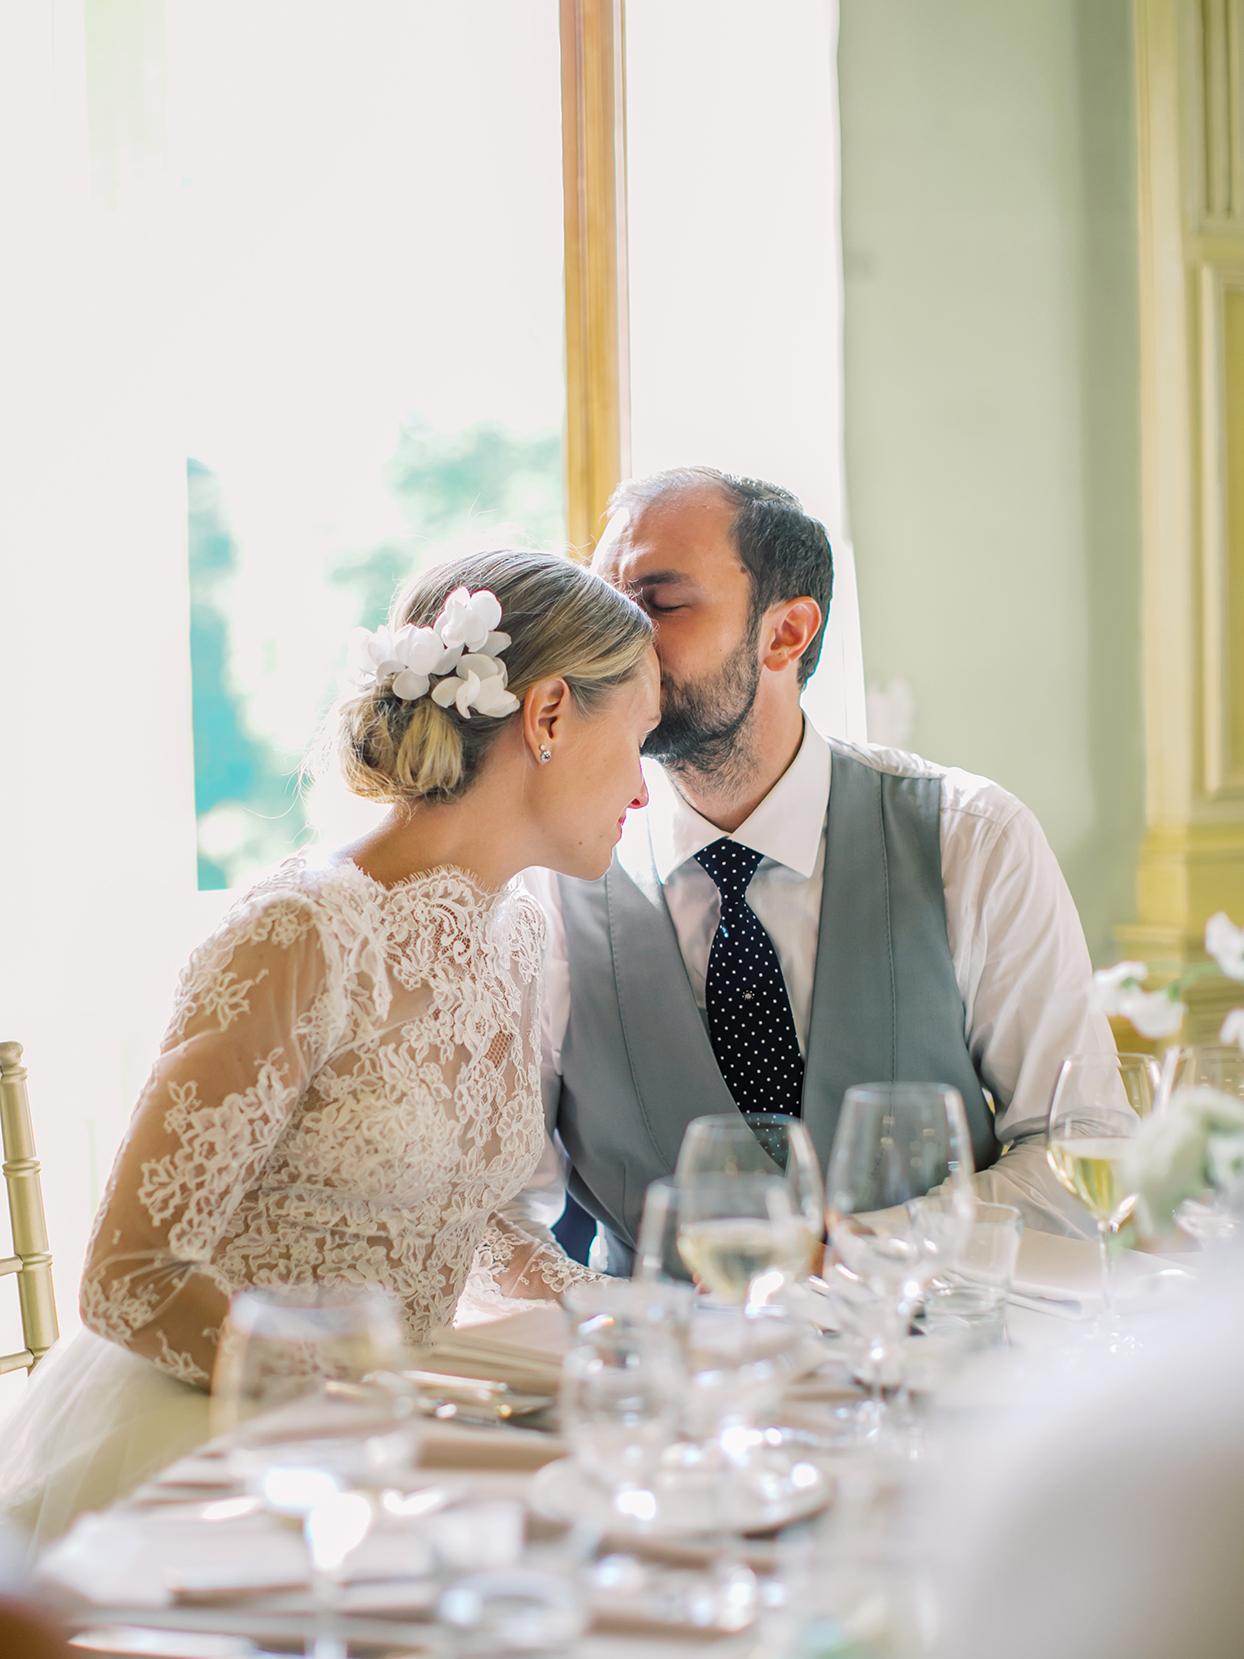 laura alexander wedding speech couple at table